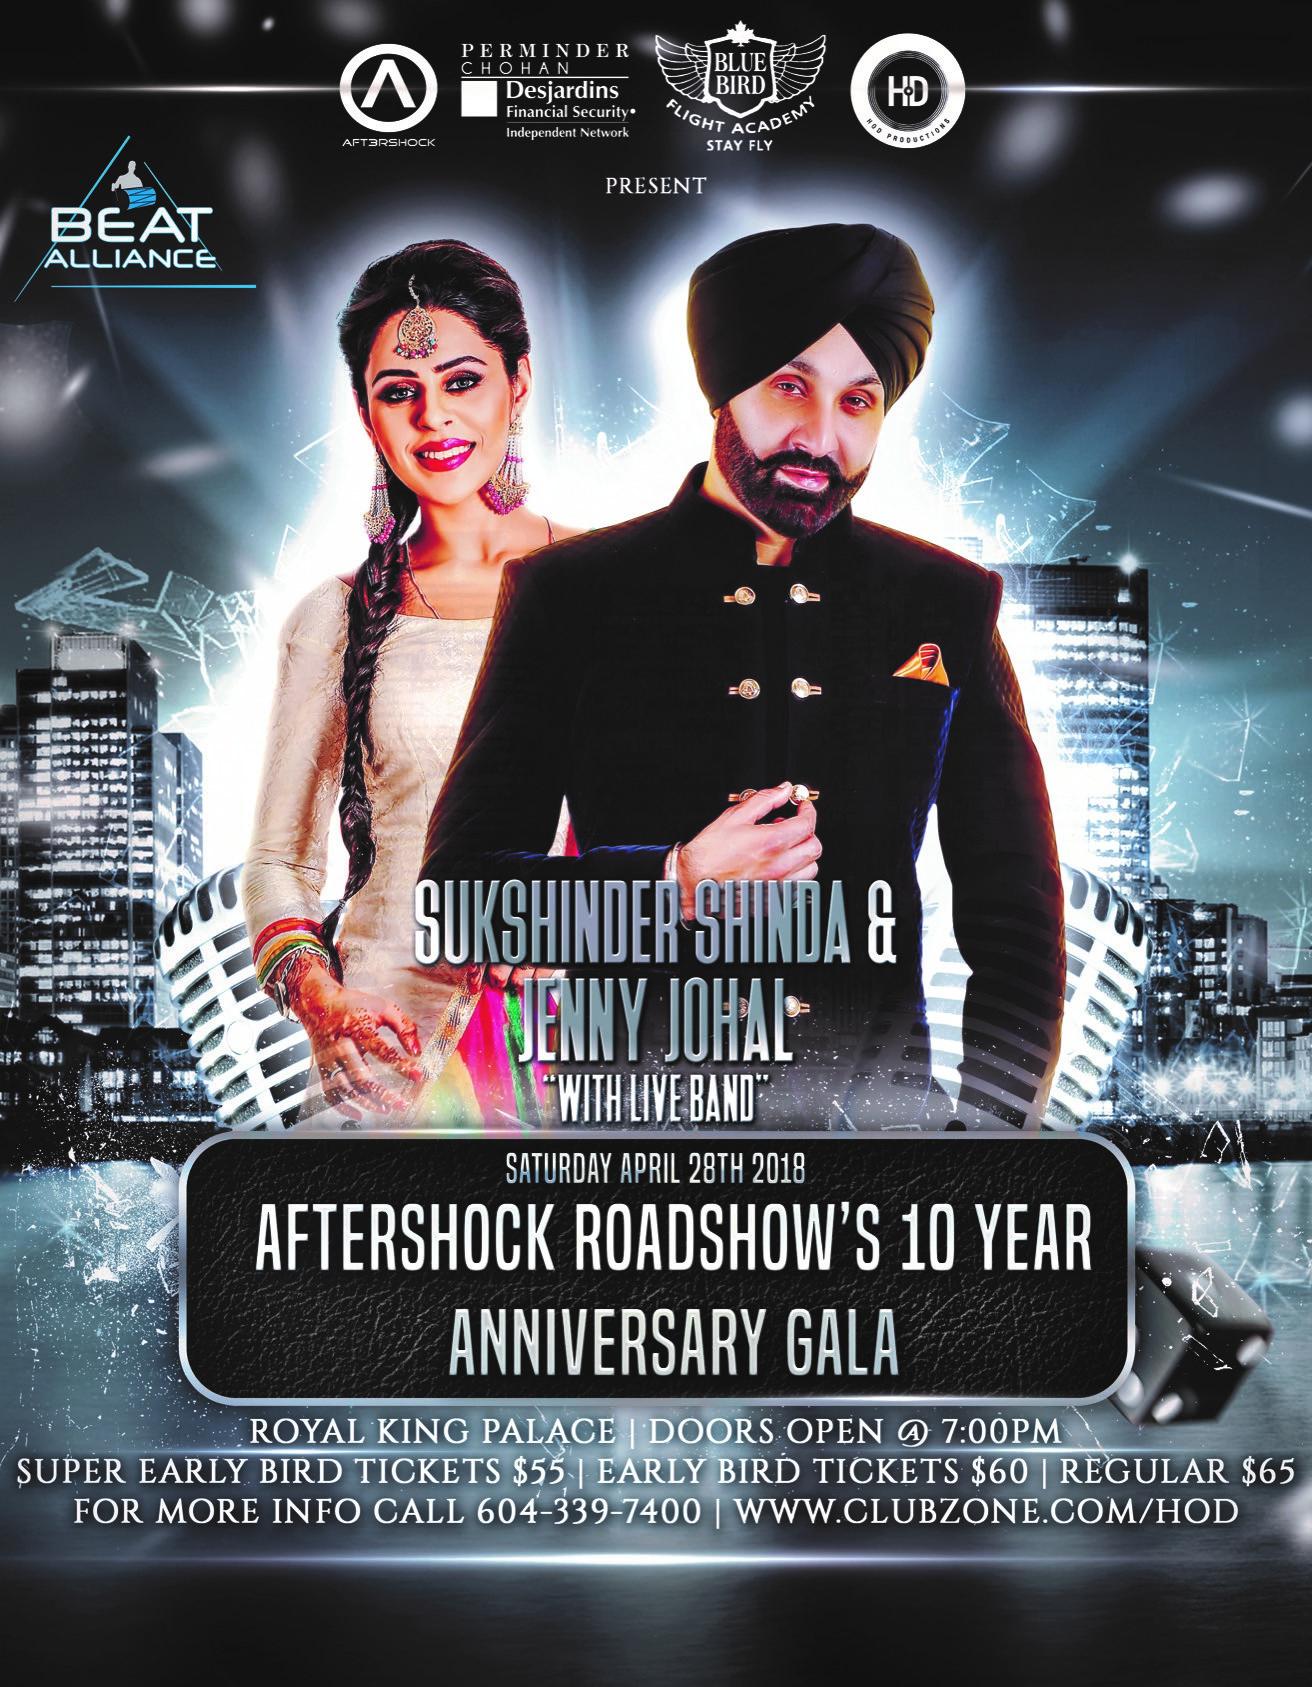 Aftershock Roadshow's 10 Year Anniversary Gala